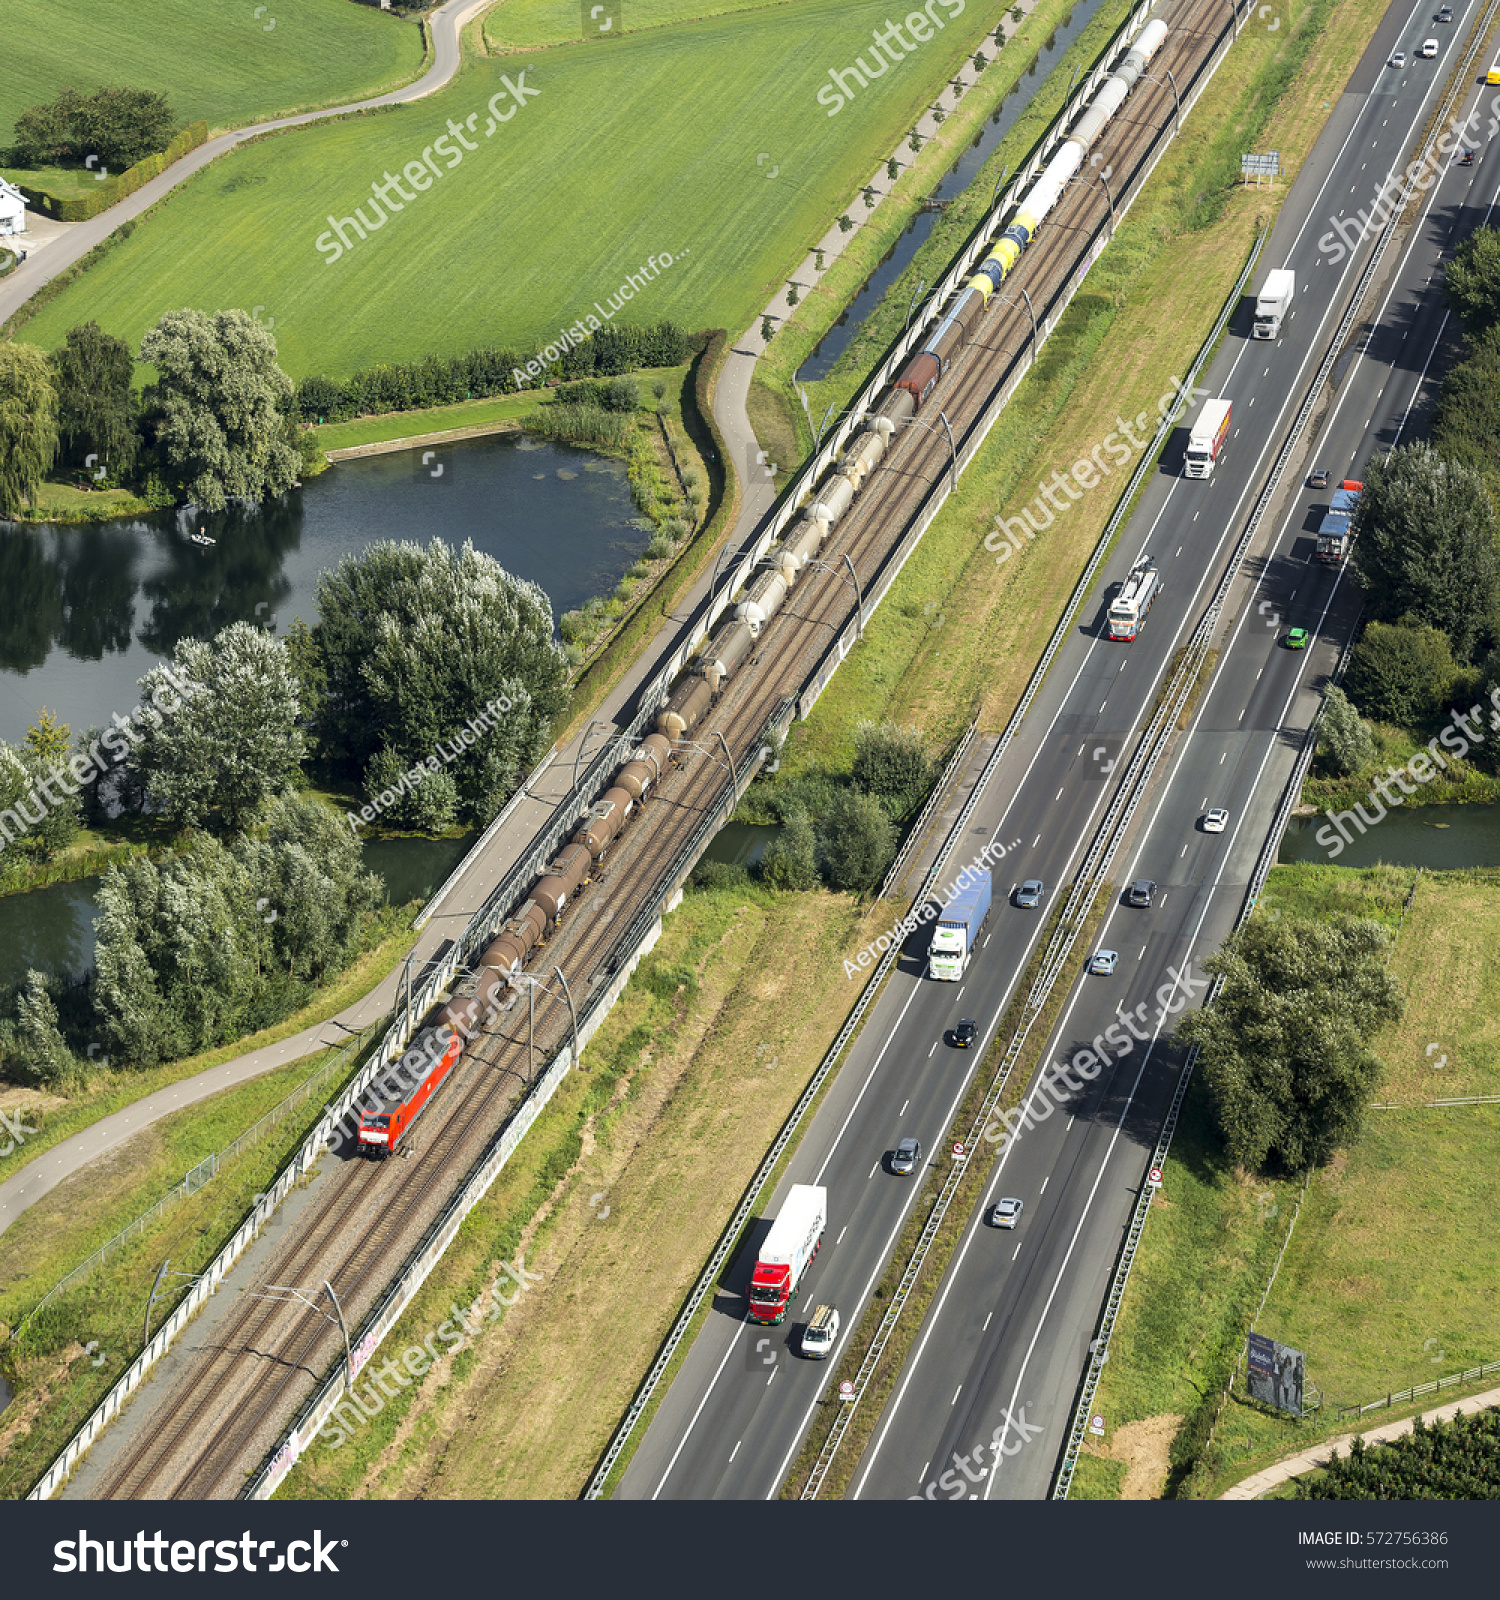 6 June 2016 Geldermalsen Netherlands Aerial Stock Photo ...